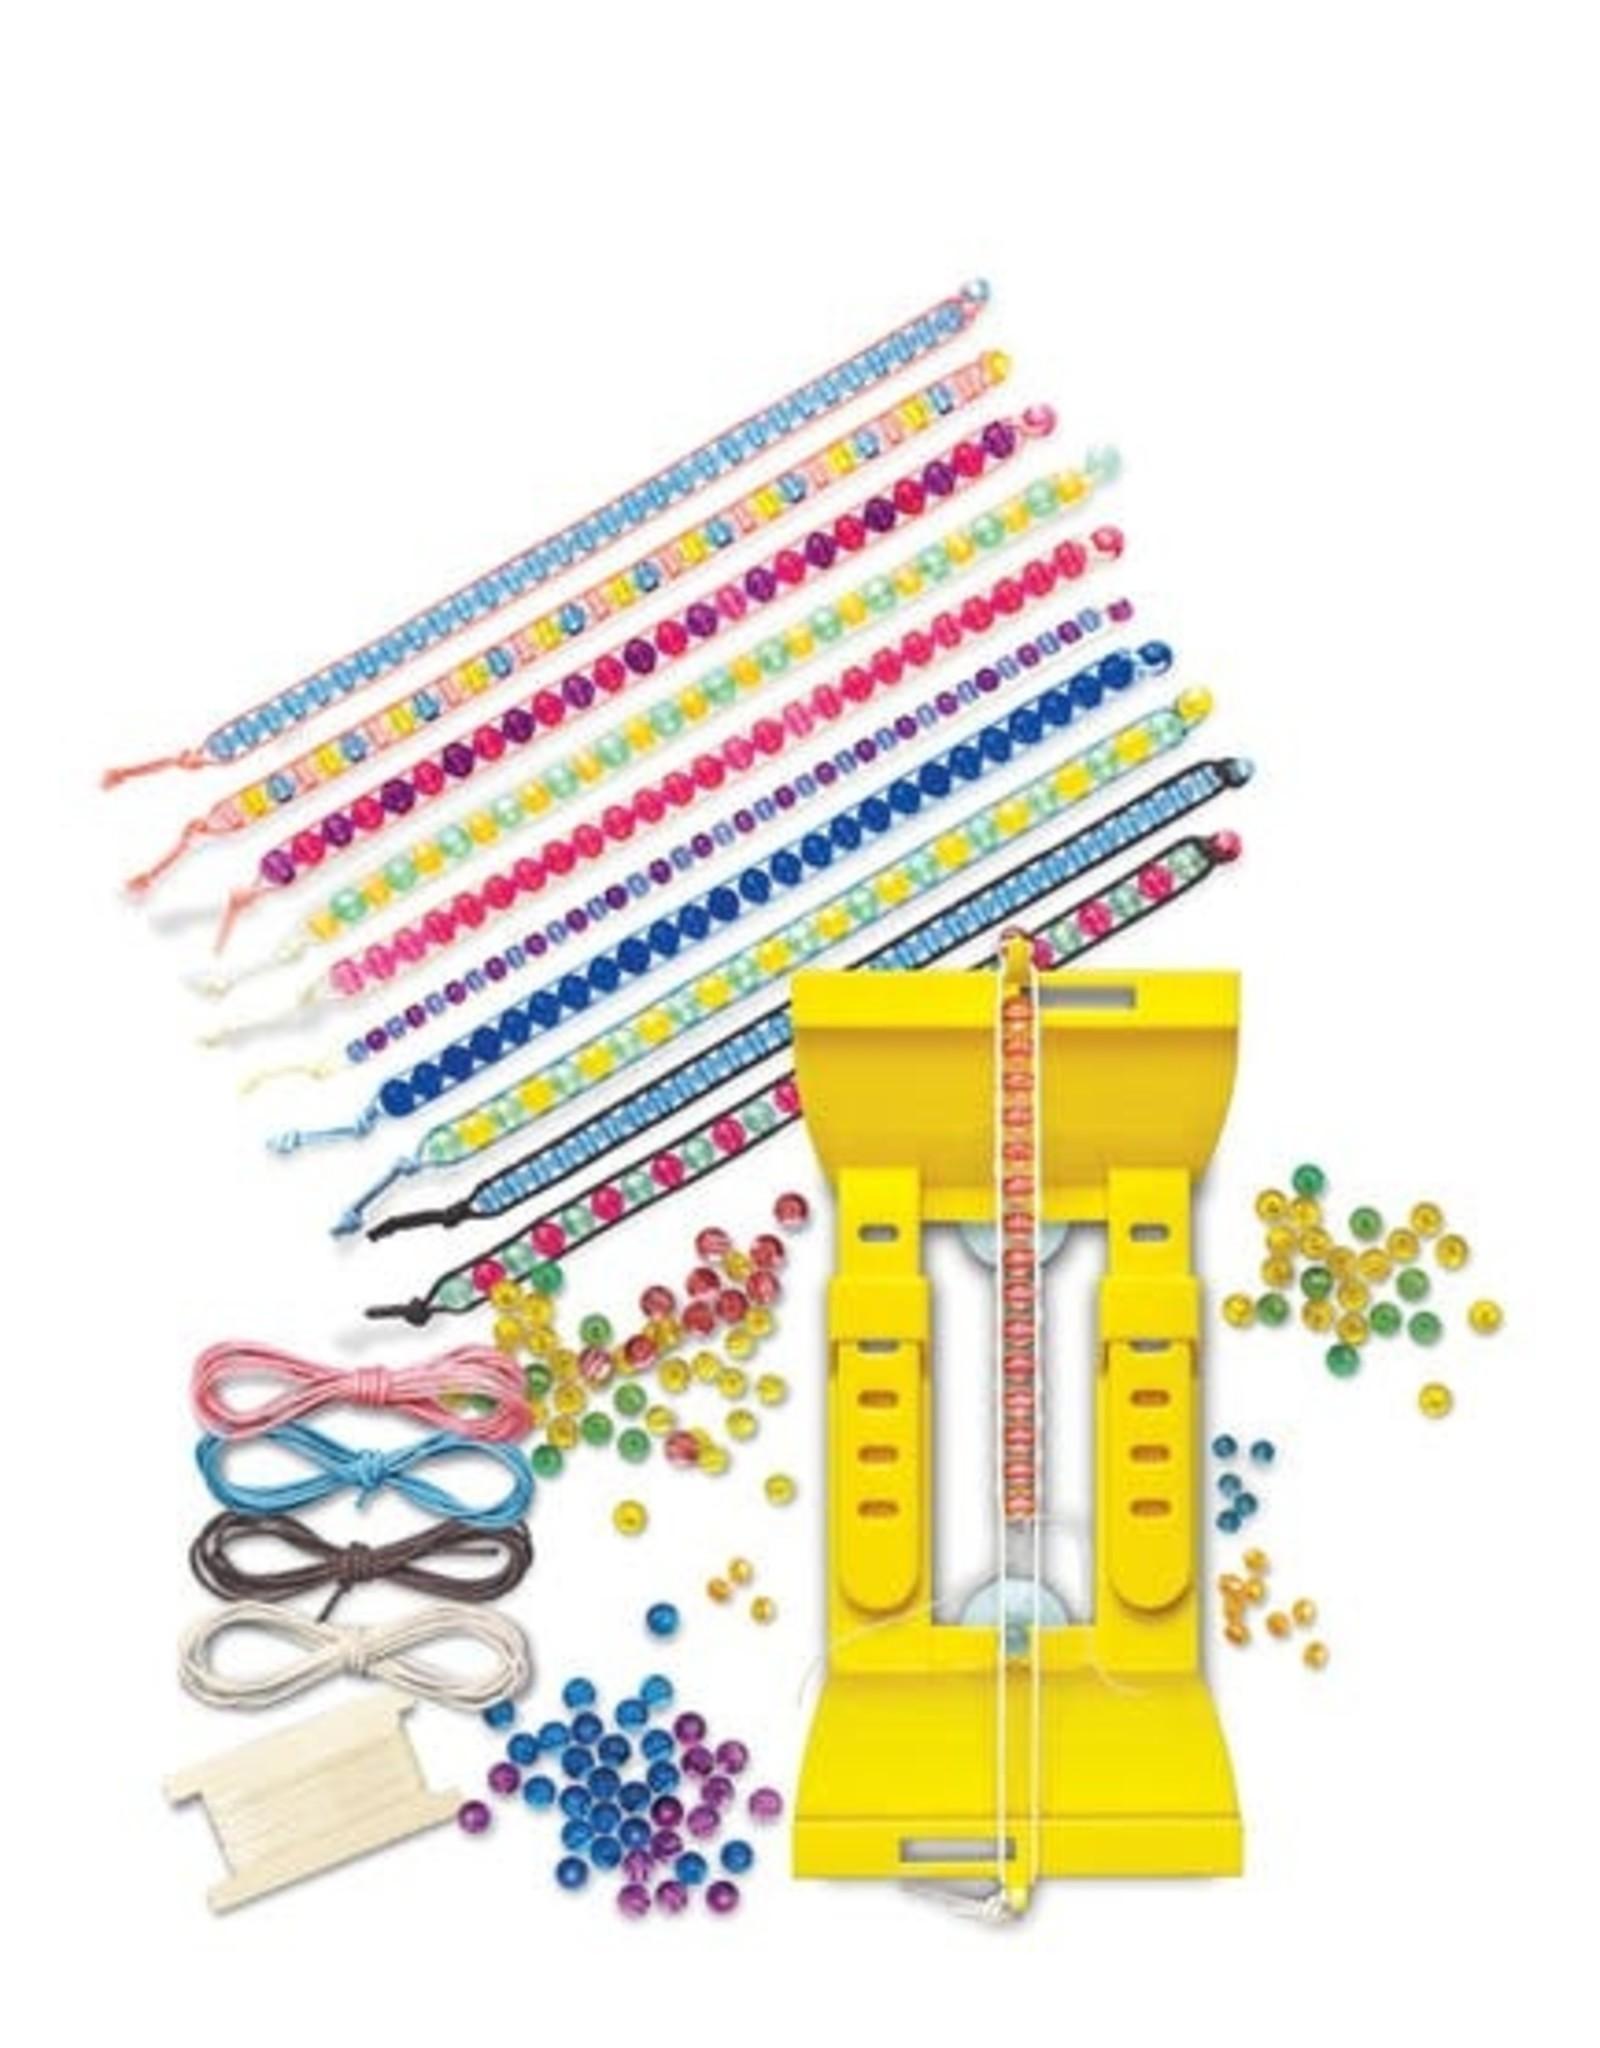 Toysmith Charming Bead Bracelet Kit